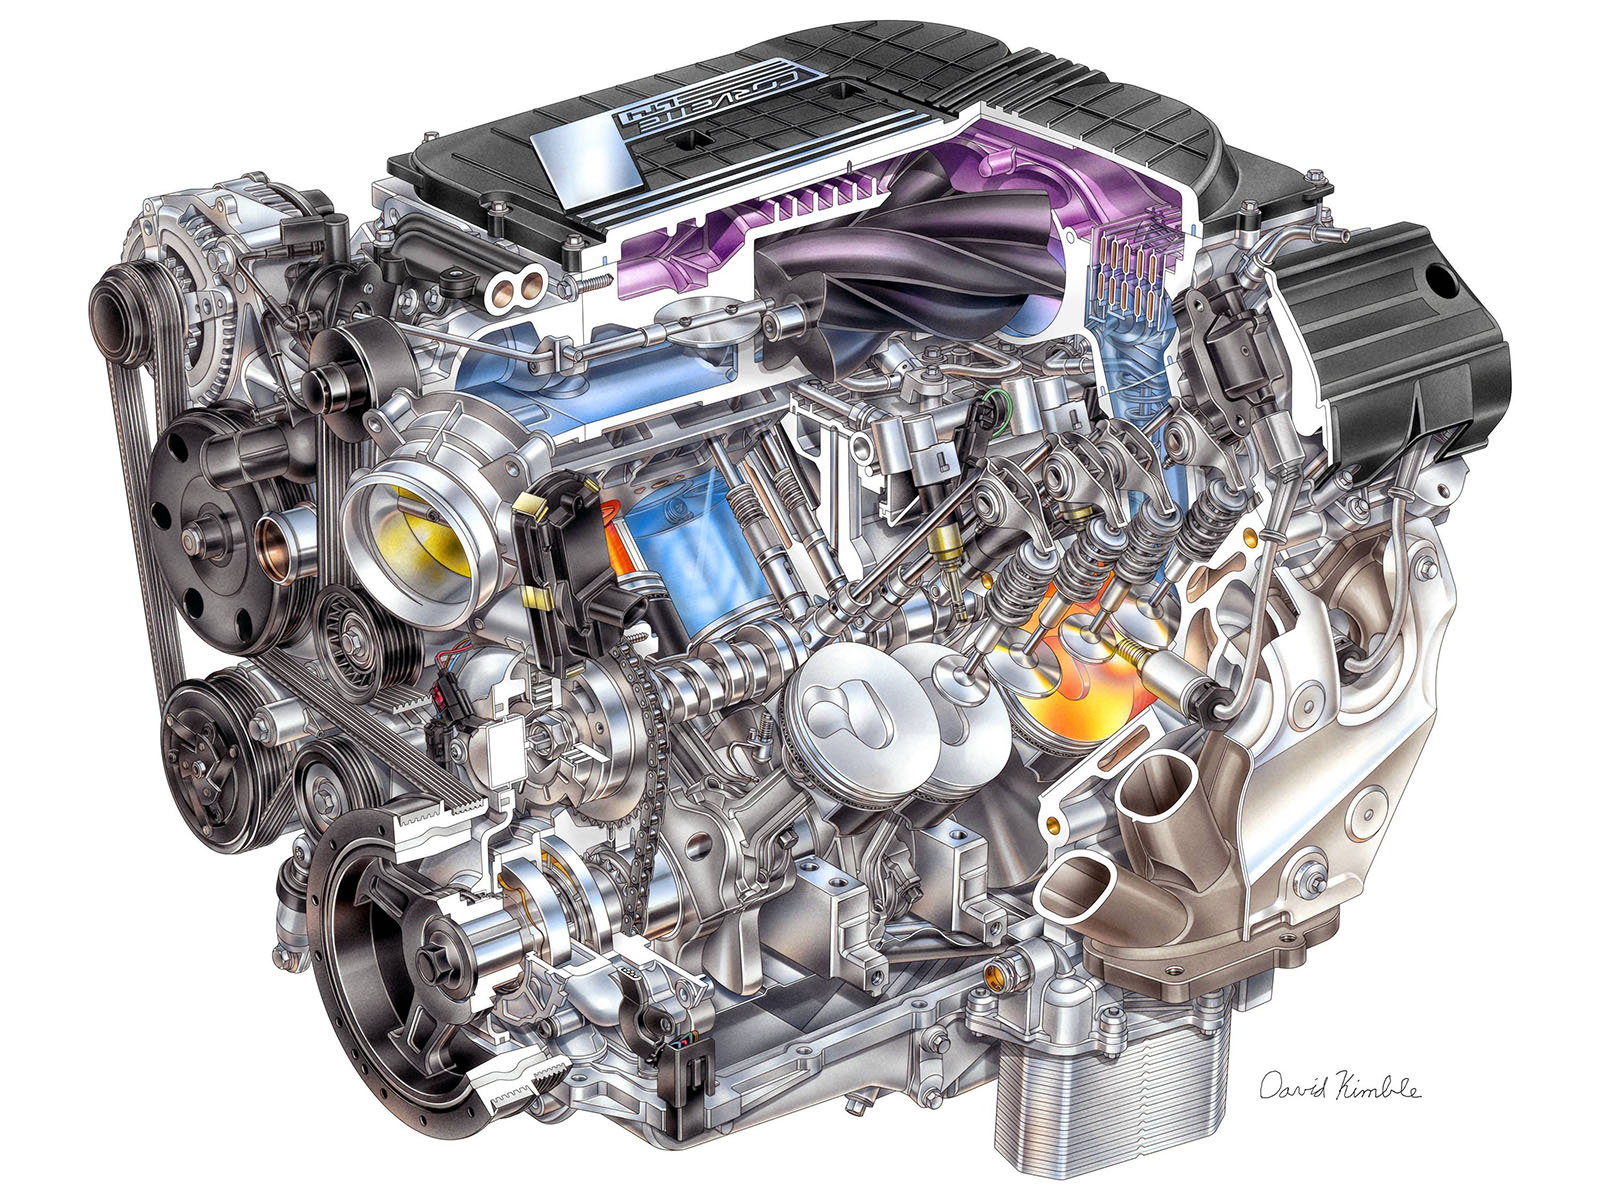 hight resolution of guide to fueling for higher horsepower lt4 zl1s camaro6 on mercedes maf sensor wiring diagram